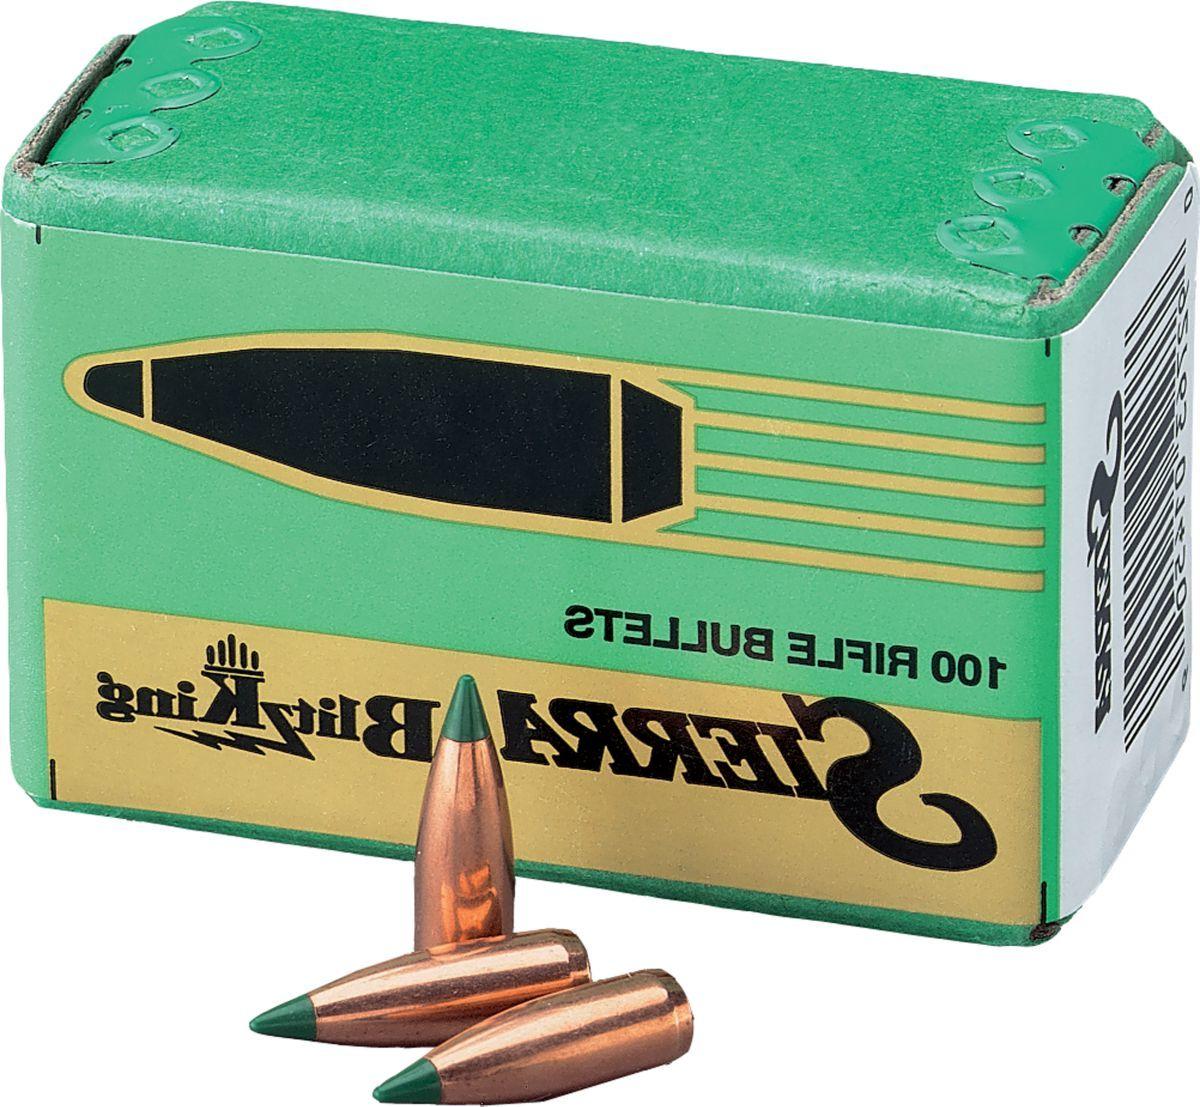 Sierra .20 Caliber Rifle Bullets